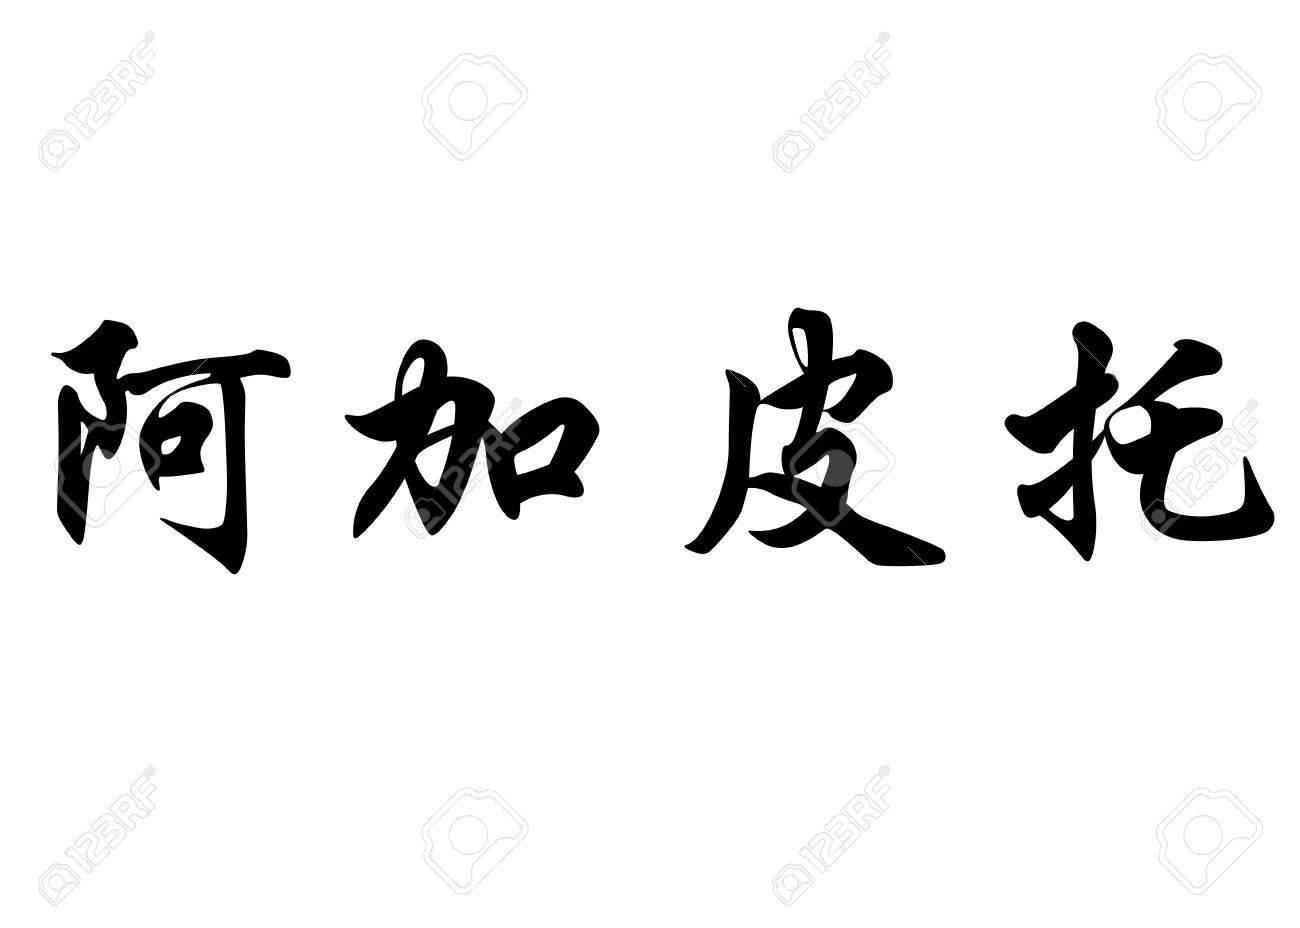 English Name Agapito In Chinese Kanji Calligraphy Characters Stock